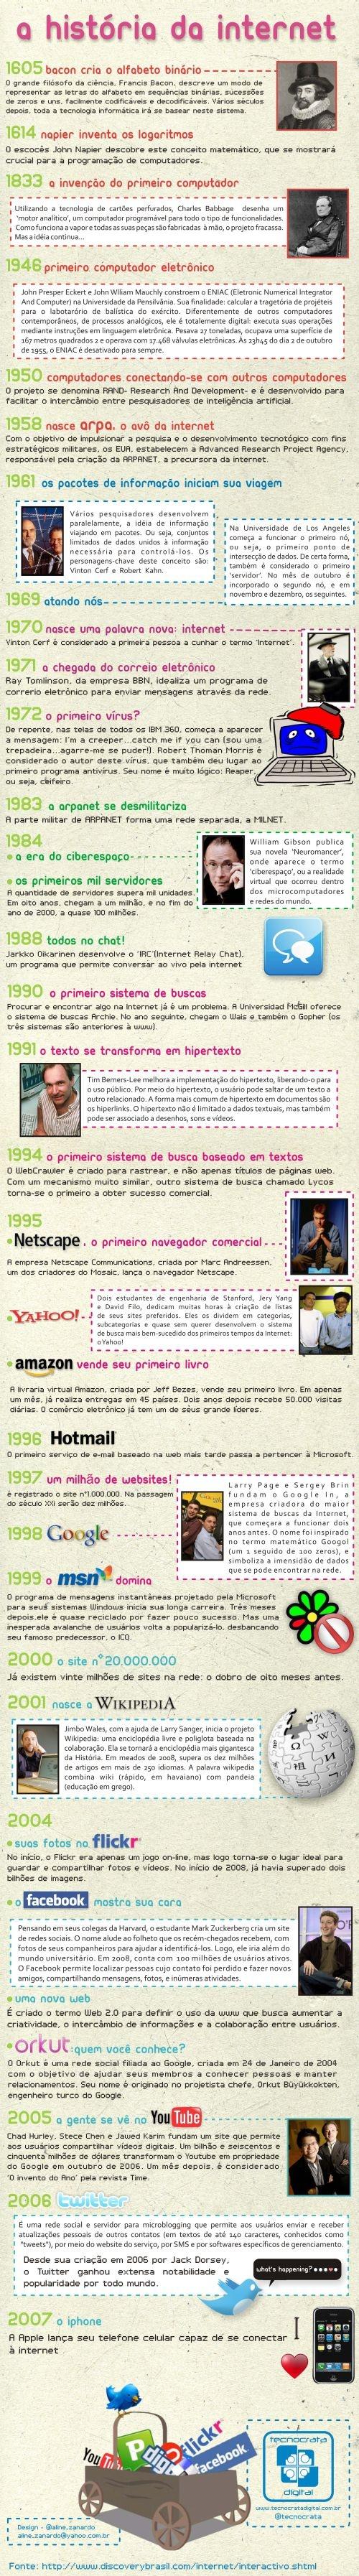 The History of the Internet, by Aline Zanardo (Brasil)